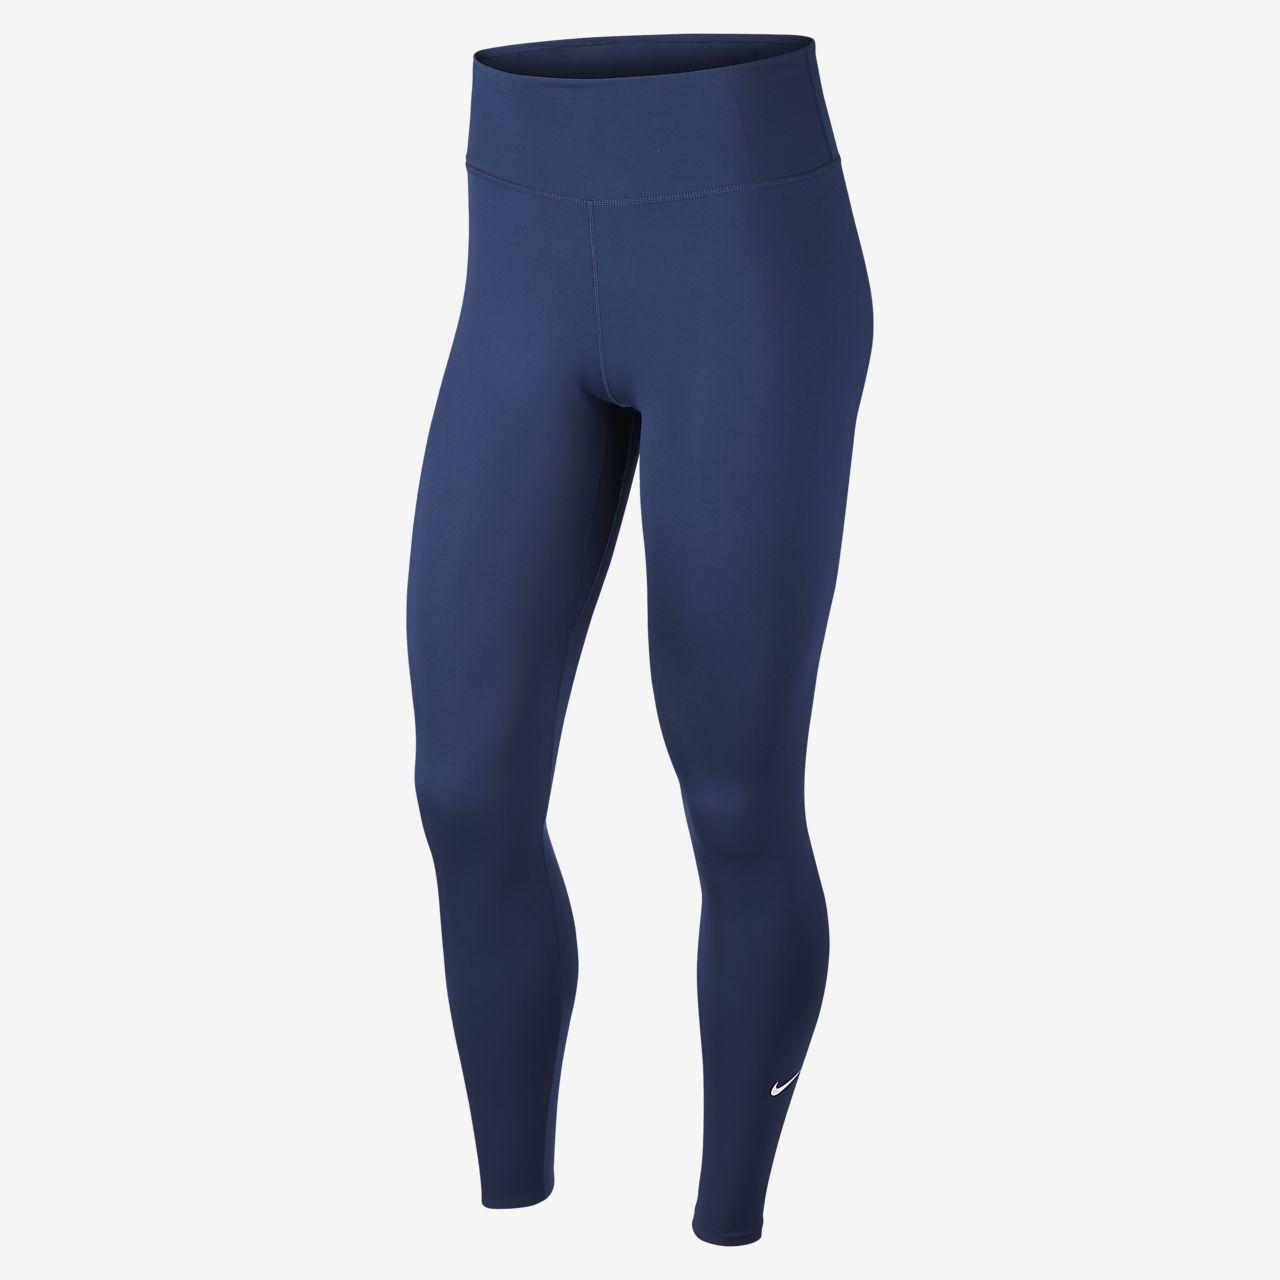 Nike One Luxe Women's Mid-Rise Leggings